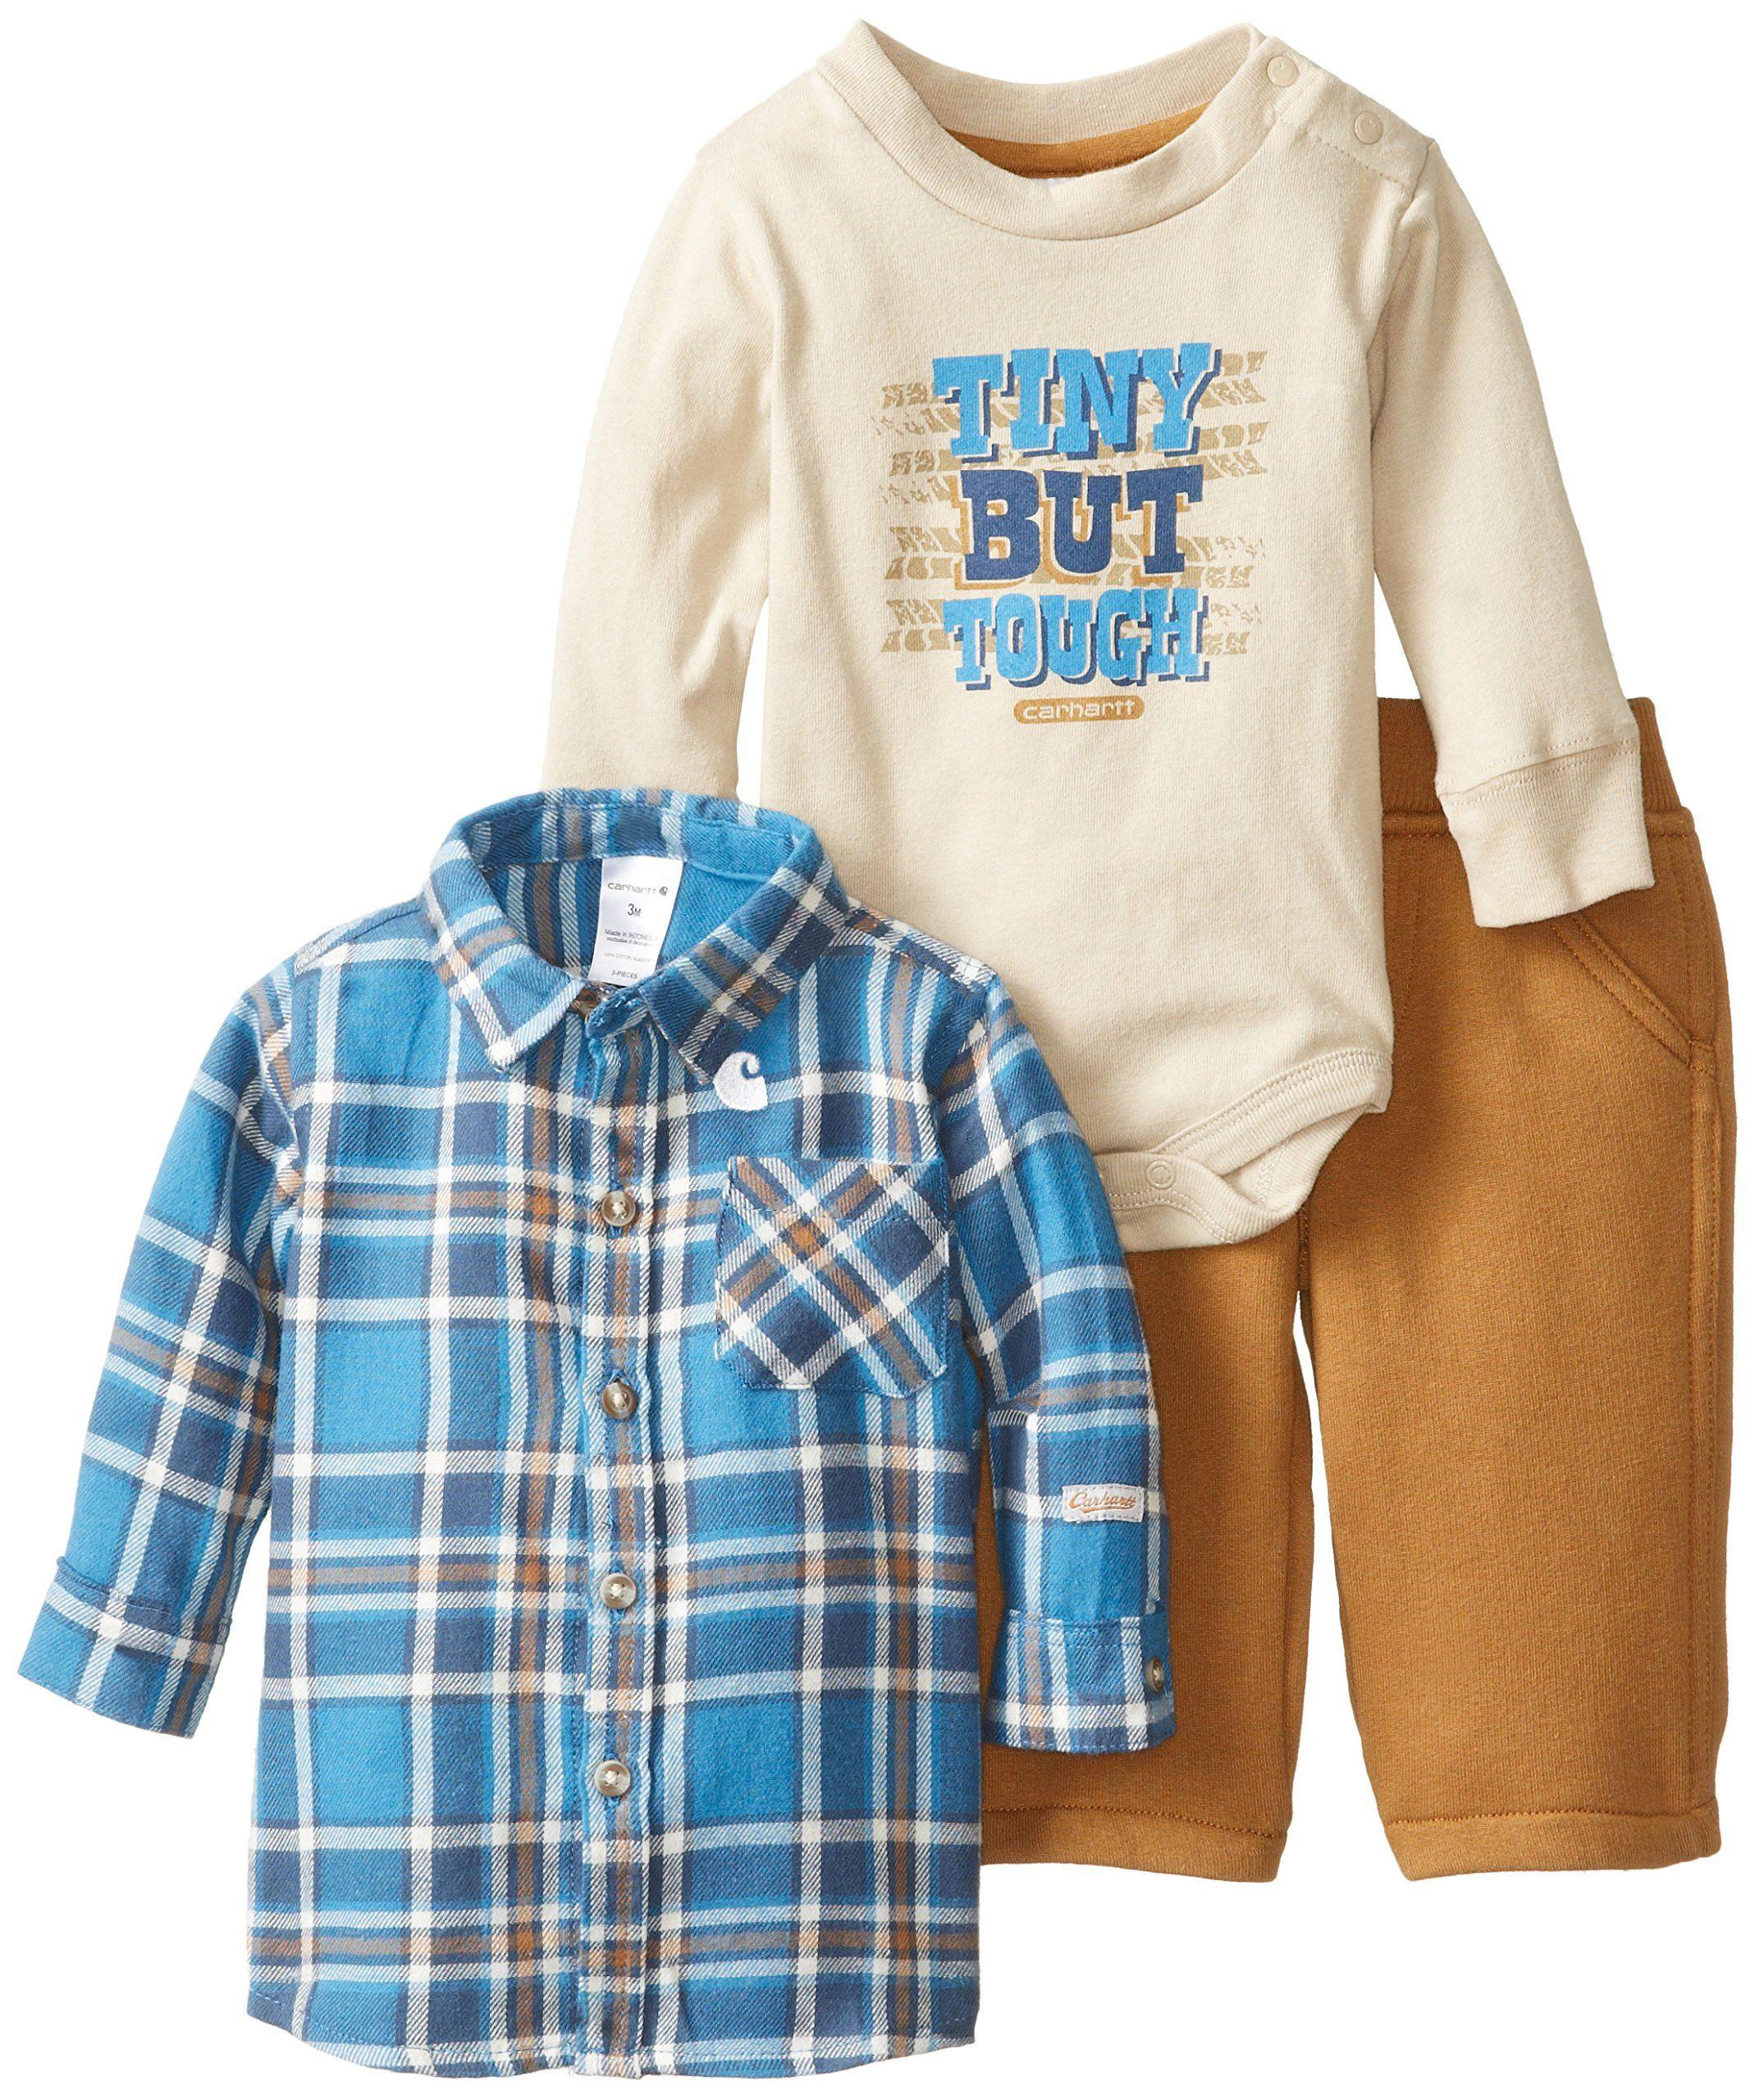 Baby Boys Clothing Set 3PC Football Bodysuit Hat Pants Gift Set NB-3M 3-6M 6-9M